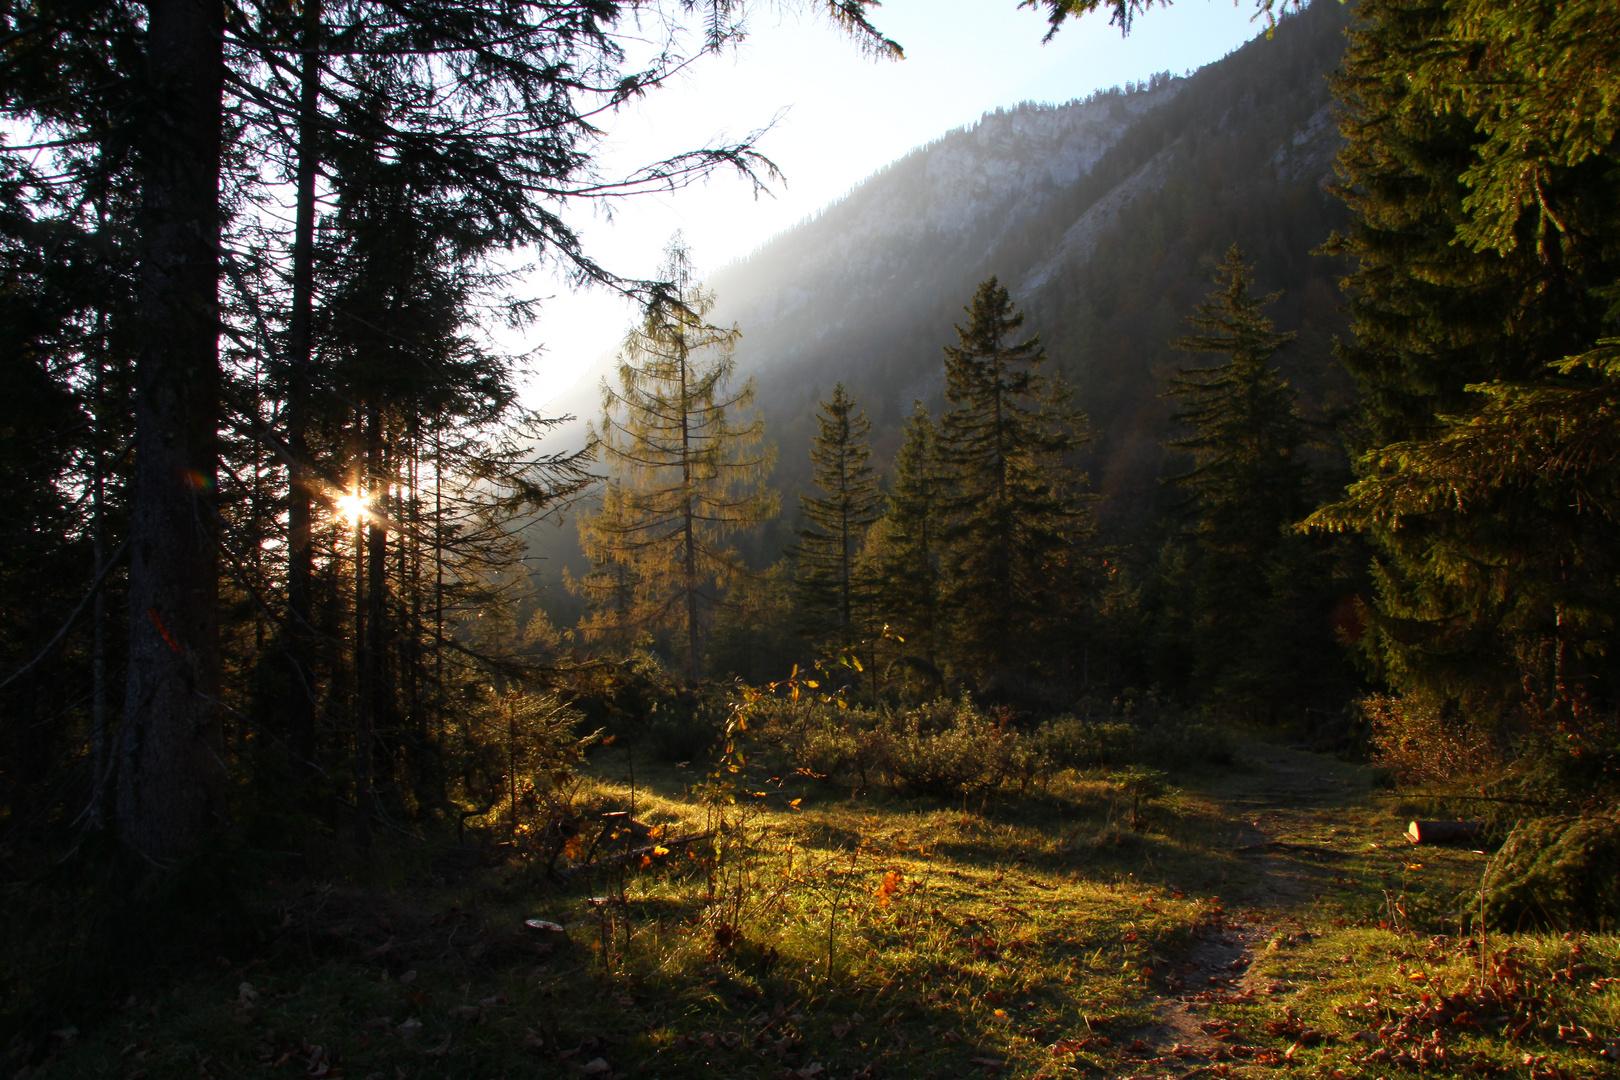 Spätherbst im Chiemgau